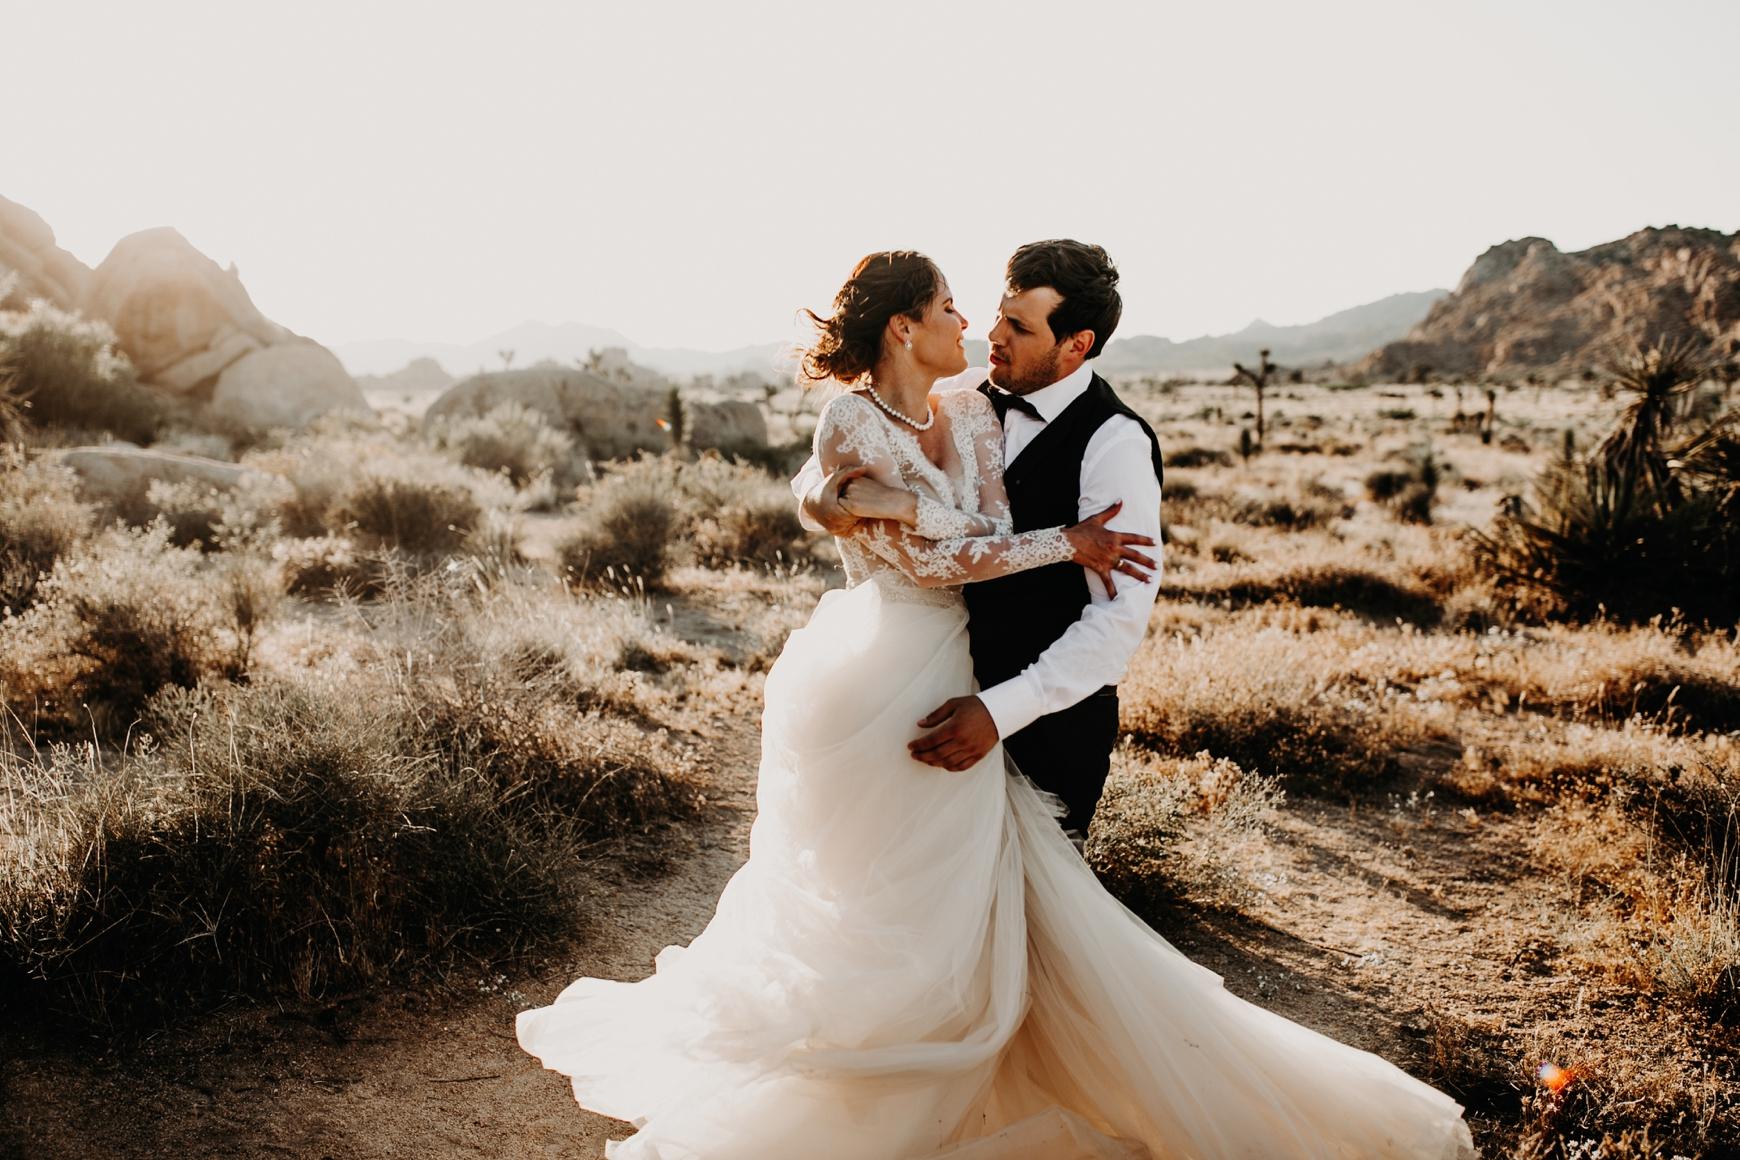 Joshua Tree Bridal Portraits Anastasia & Andrey Emily Magers Photography-175.jpg